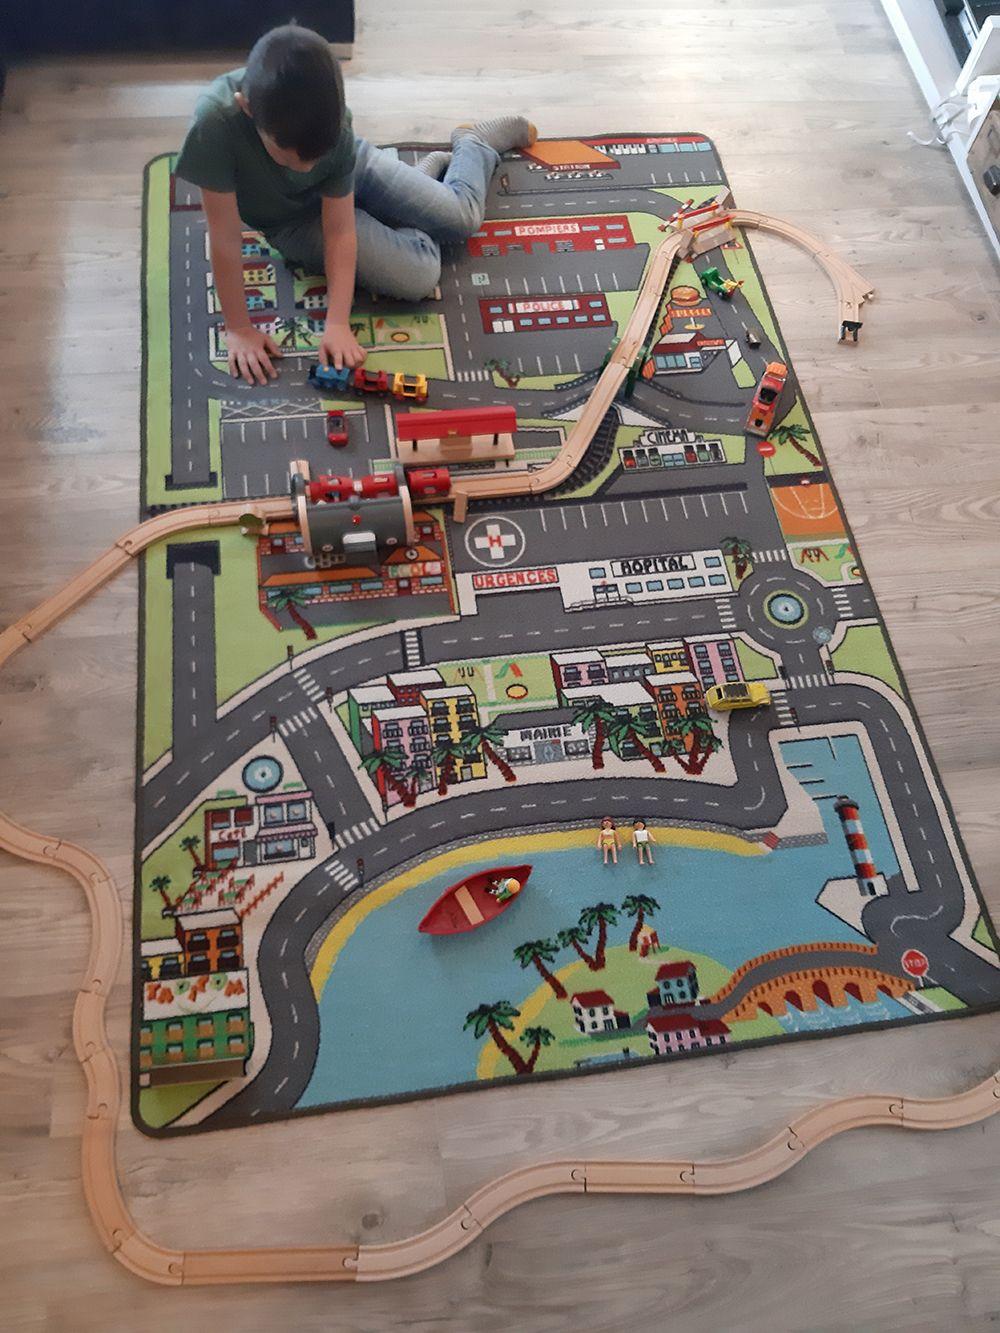 tapitom tapis de jeu pour enfant